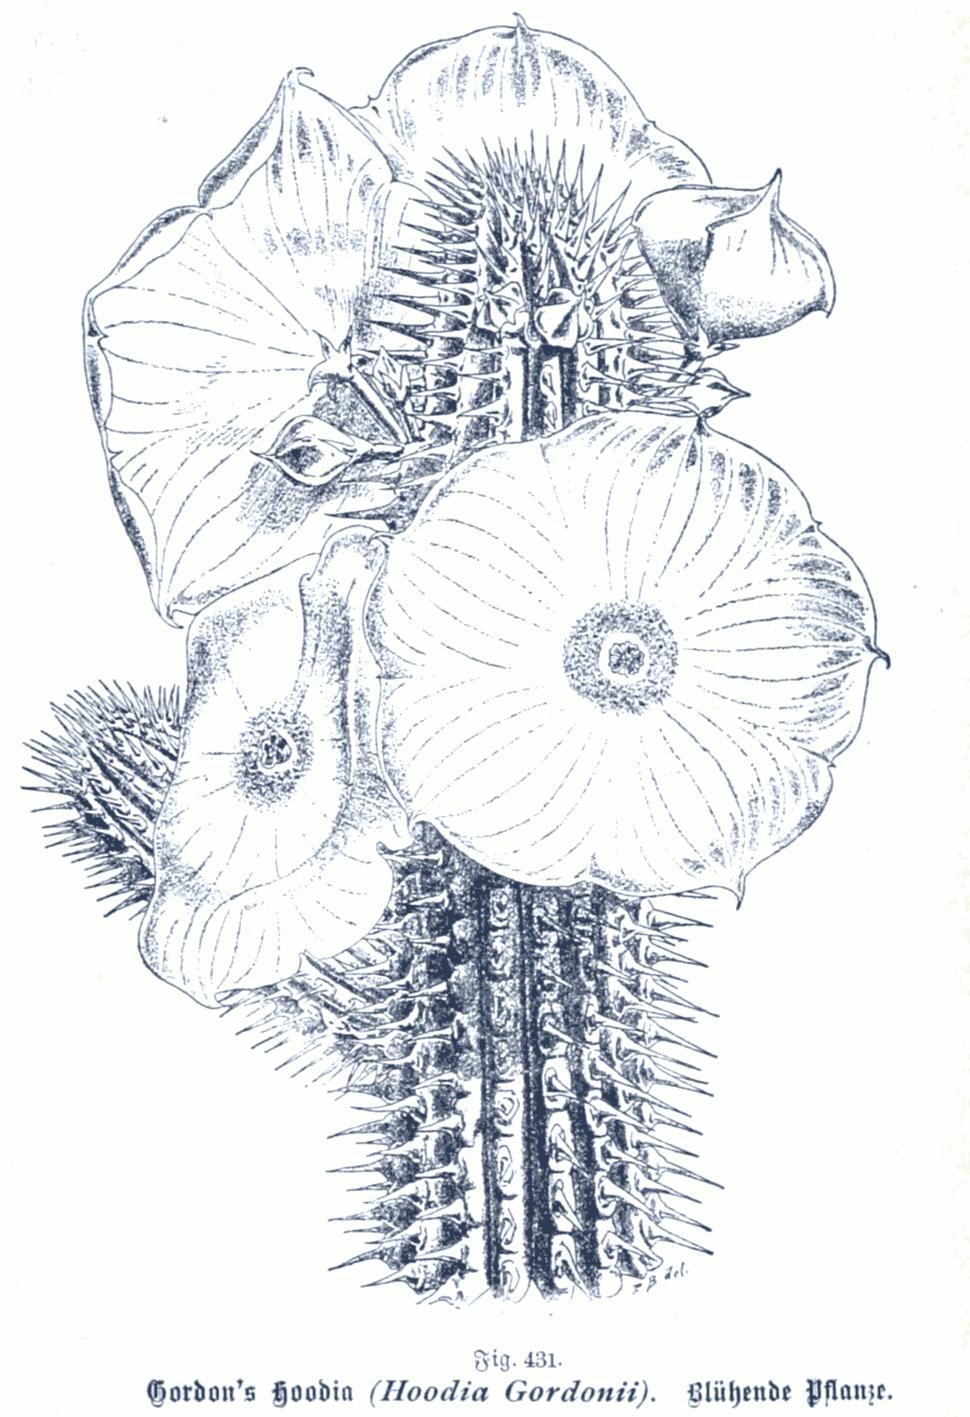 Hoodia gordonii GS431